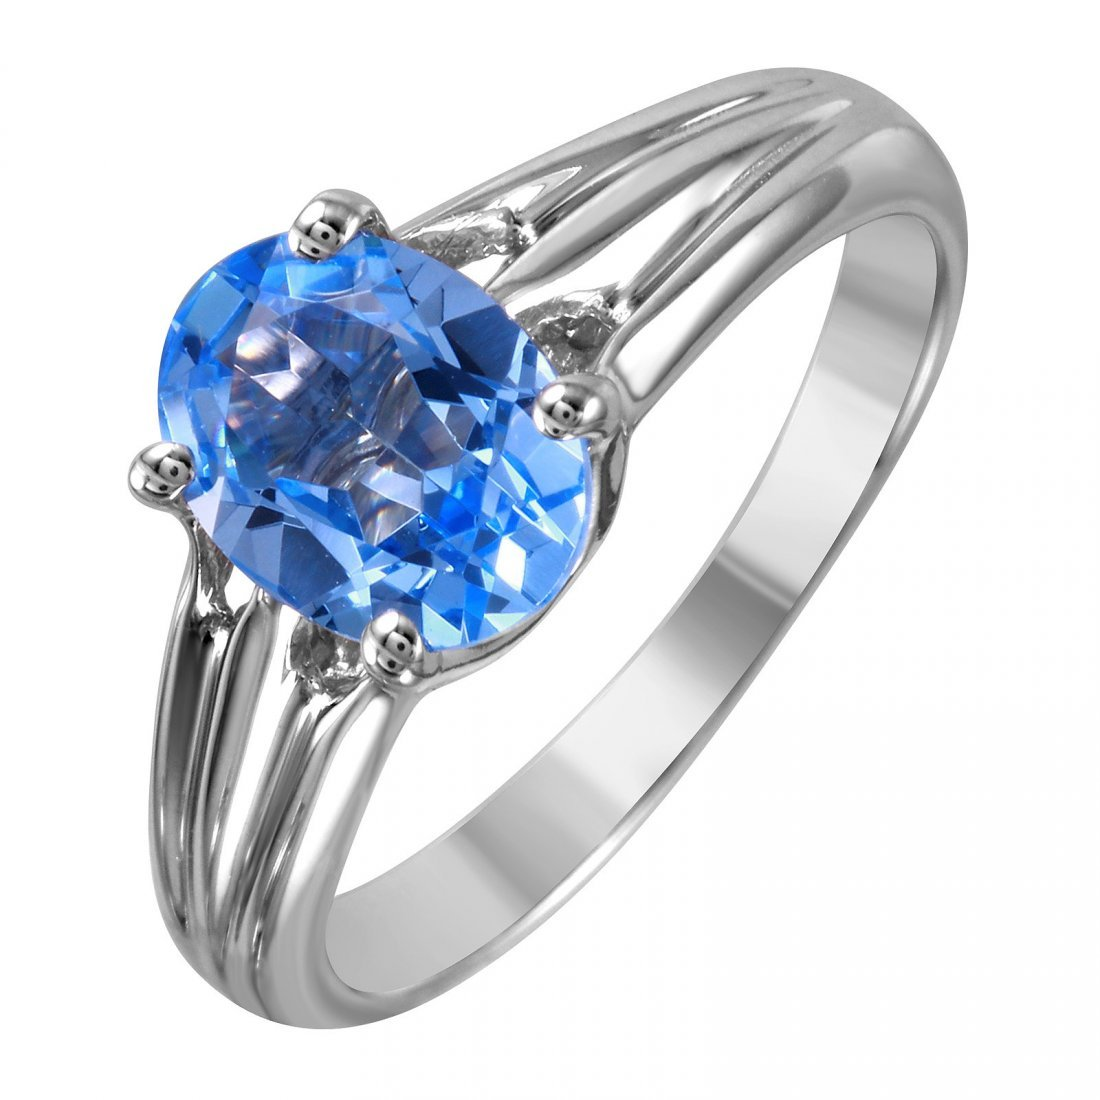 14K White Gold Aquamarine Solitaire Ring